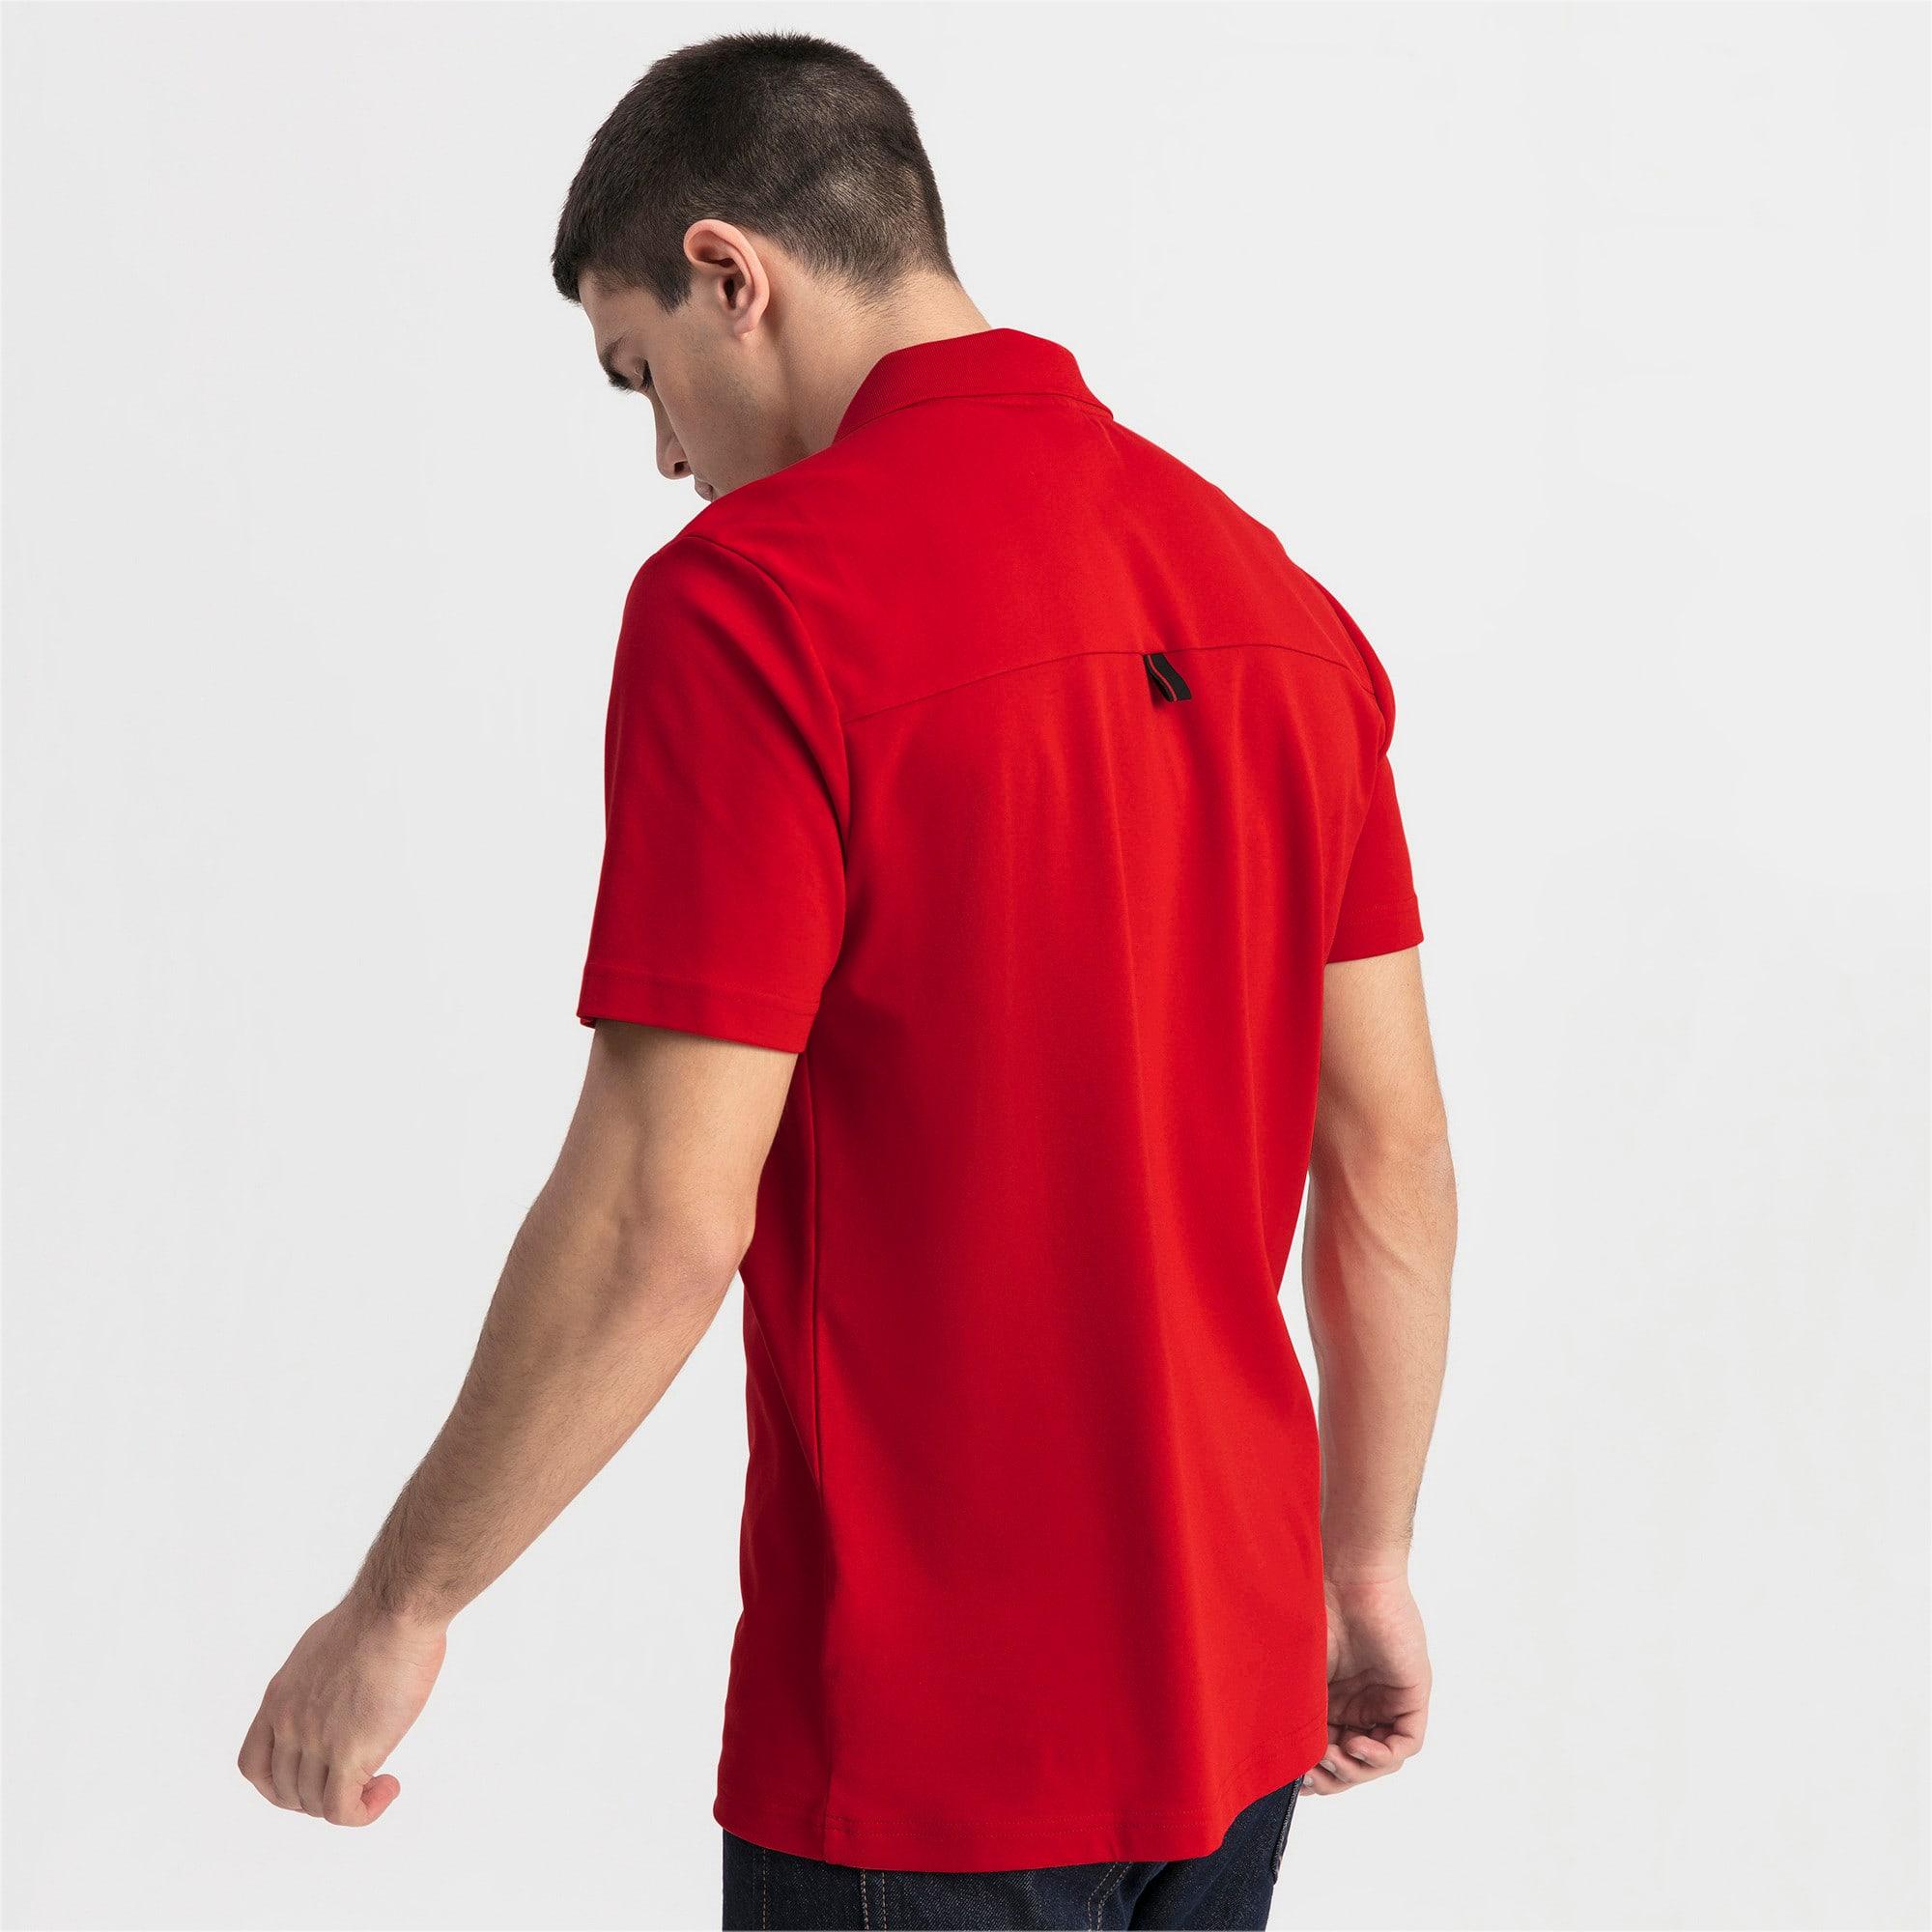 Thumbnail 2 of Ferrari Men's Polo Shirt, Rosso Corsa, medium